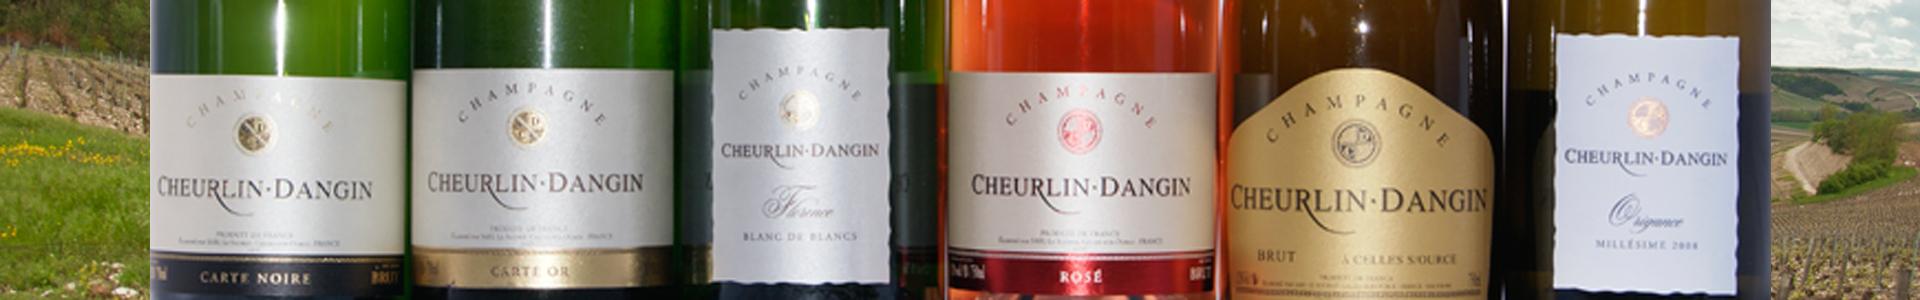 banniere champagne gamme cheulin dangin